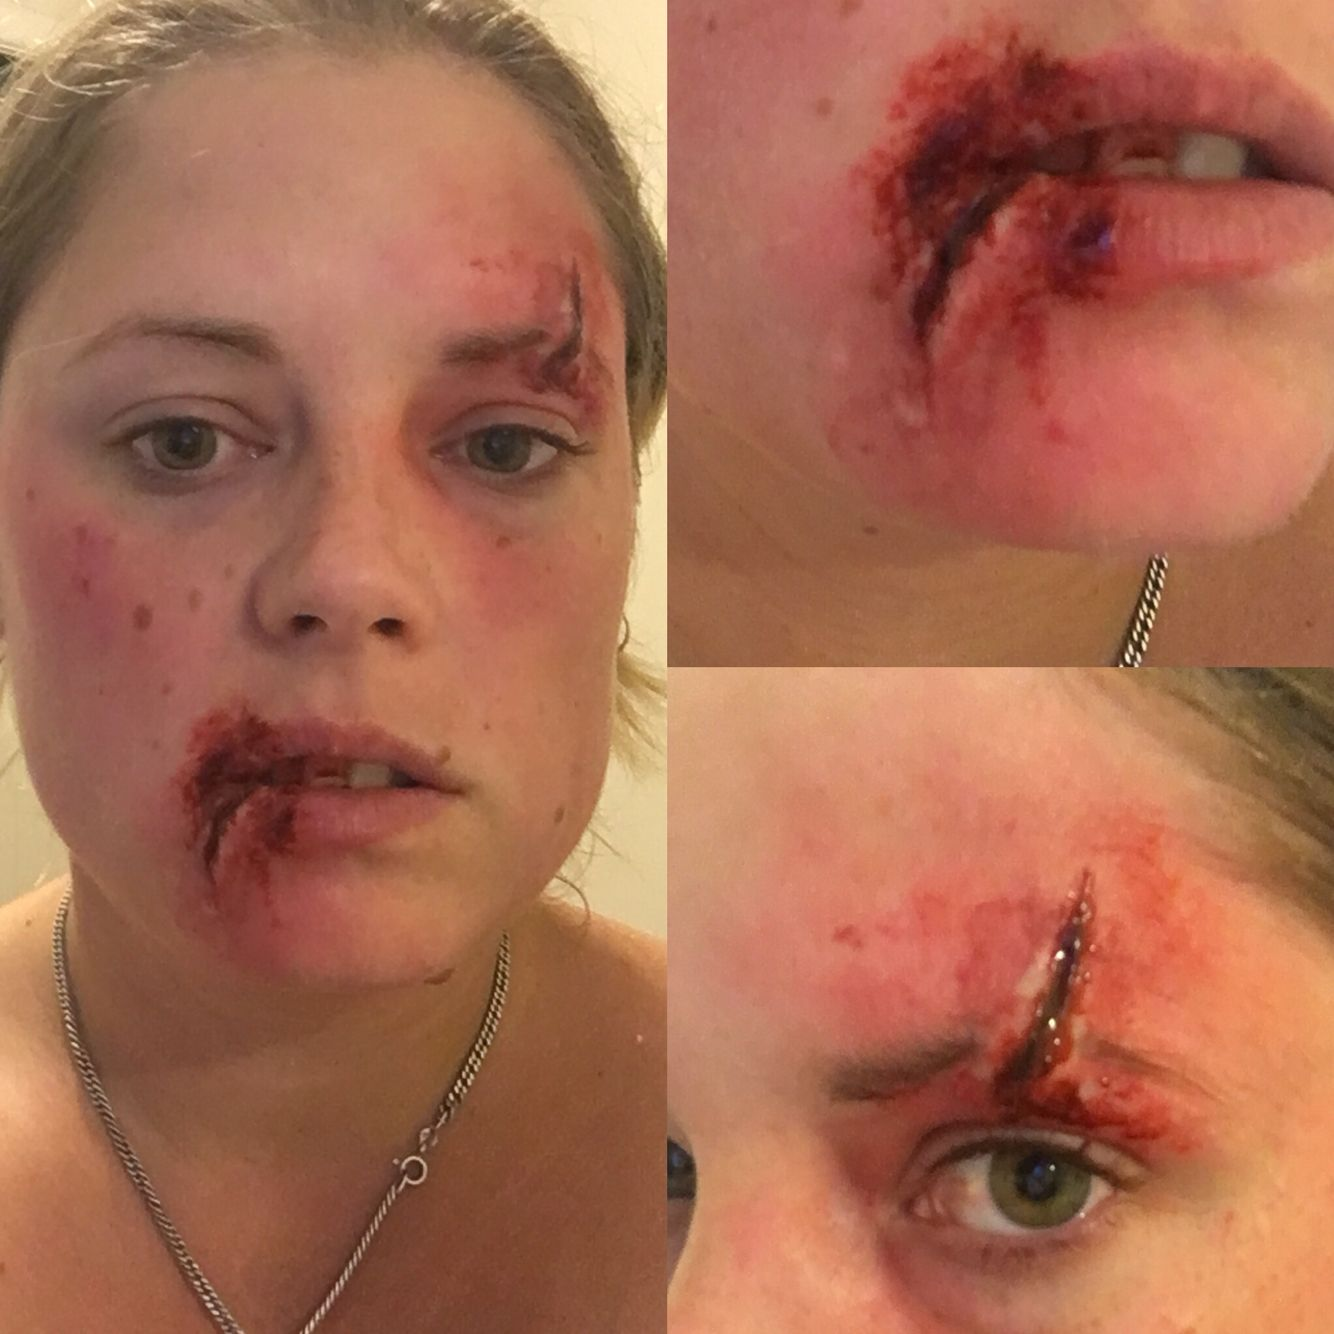 Split lip and brow wound sfx makeup | Fake it or Makeup ...